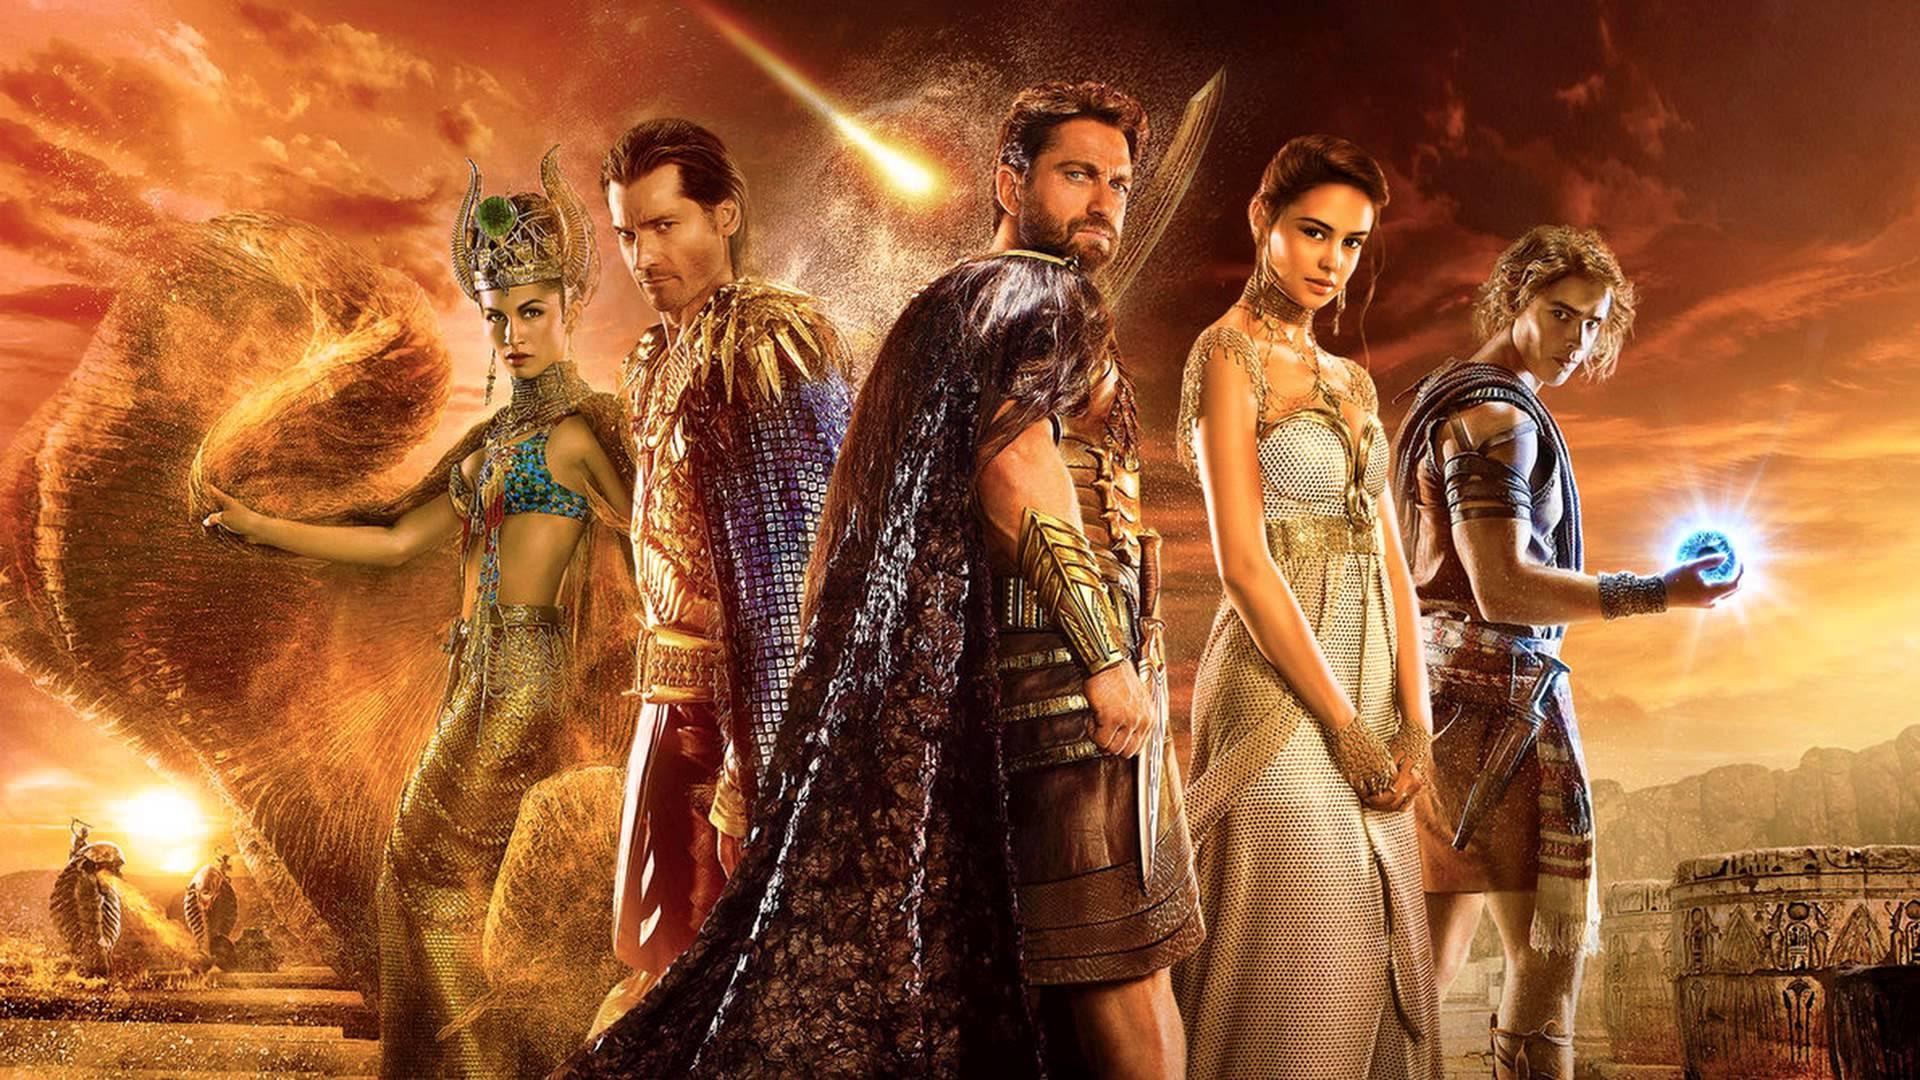 Gods of Egypt Background